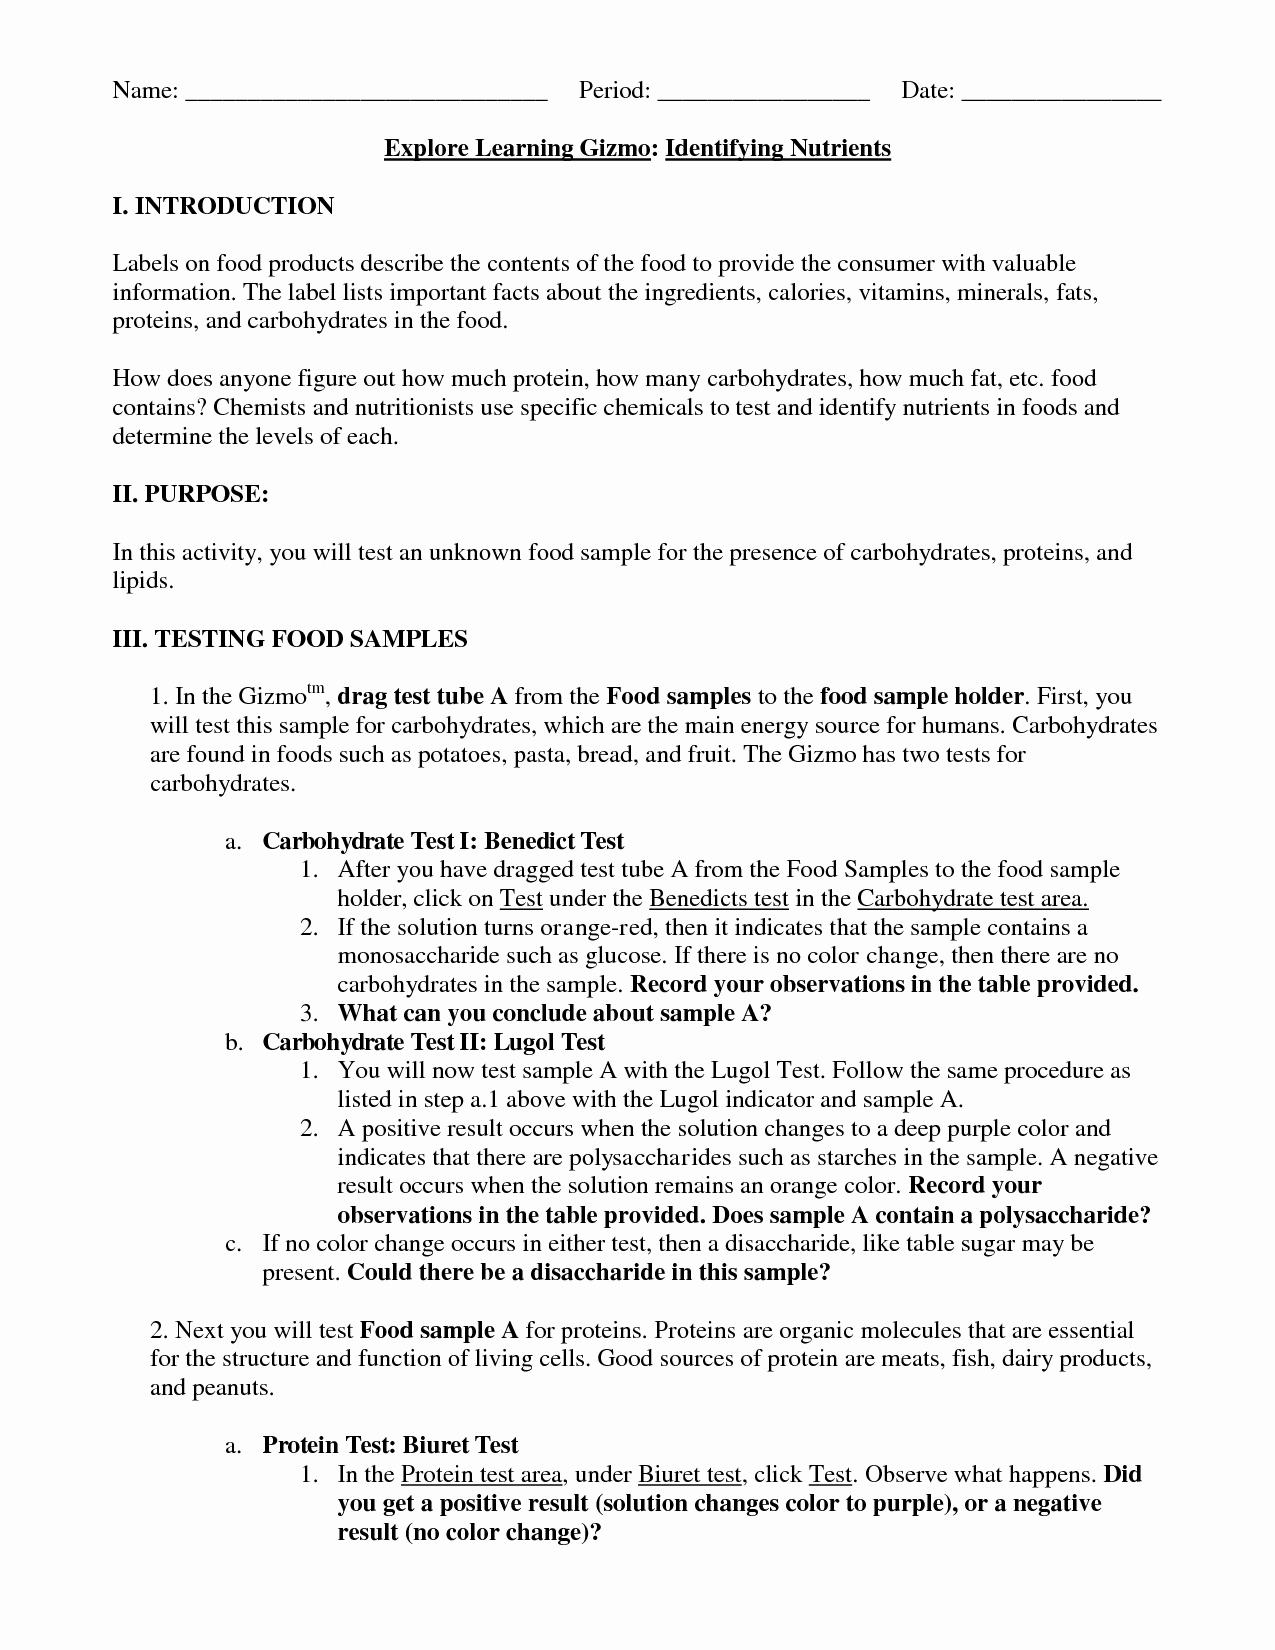 Macromolecules Worksheet #2 Answers Inspirational 16 Best Of Building Macromolecules Worksheet Answer